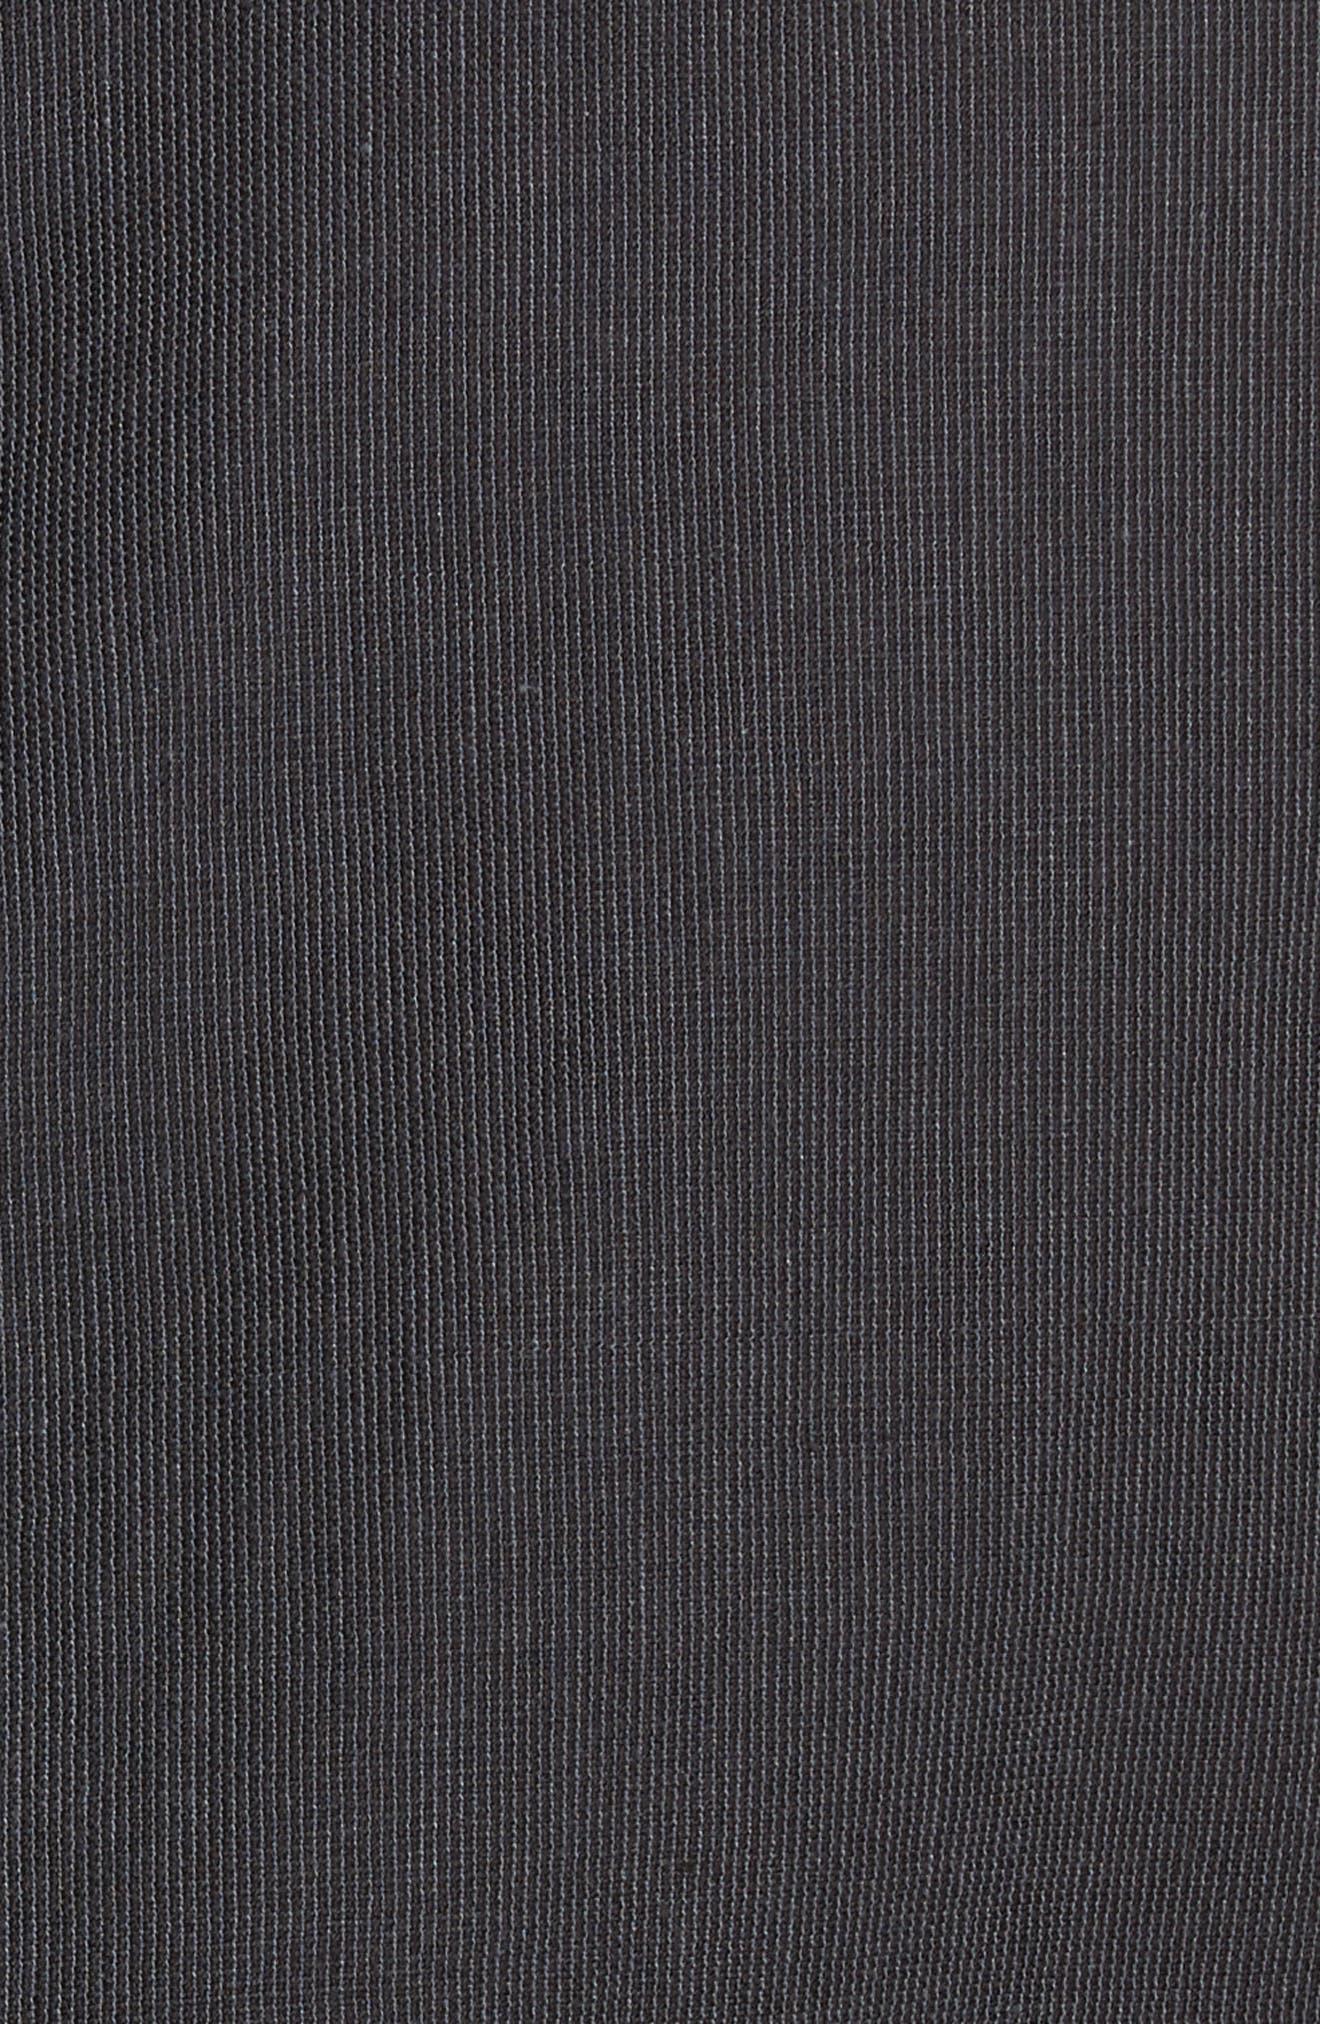 Alternate Image 5  - Ezekiel Textured Cotton Coach's Jacket